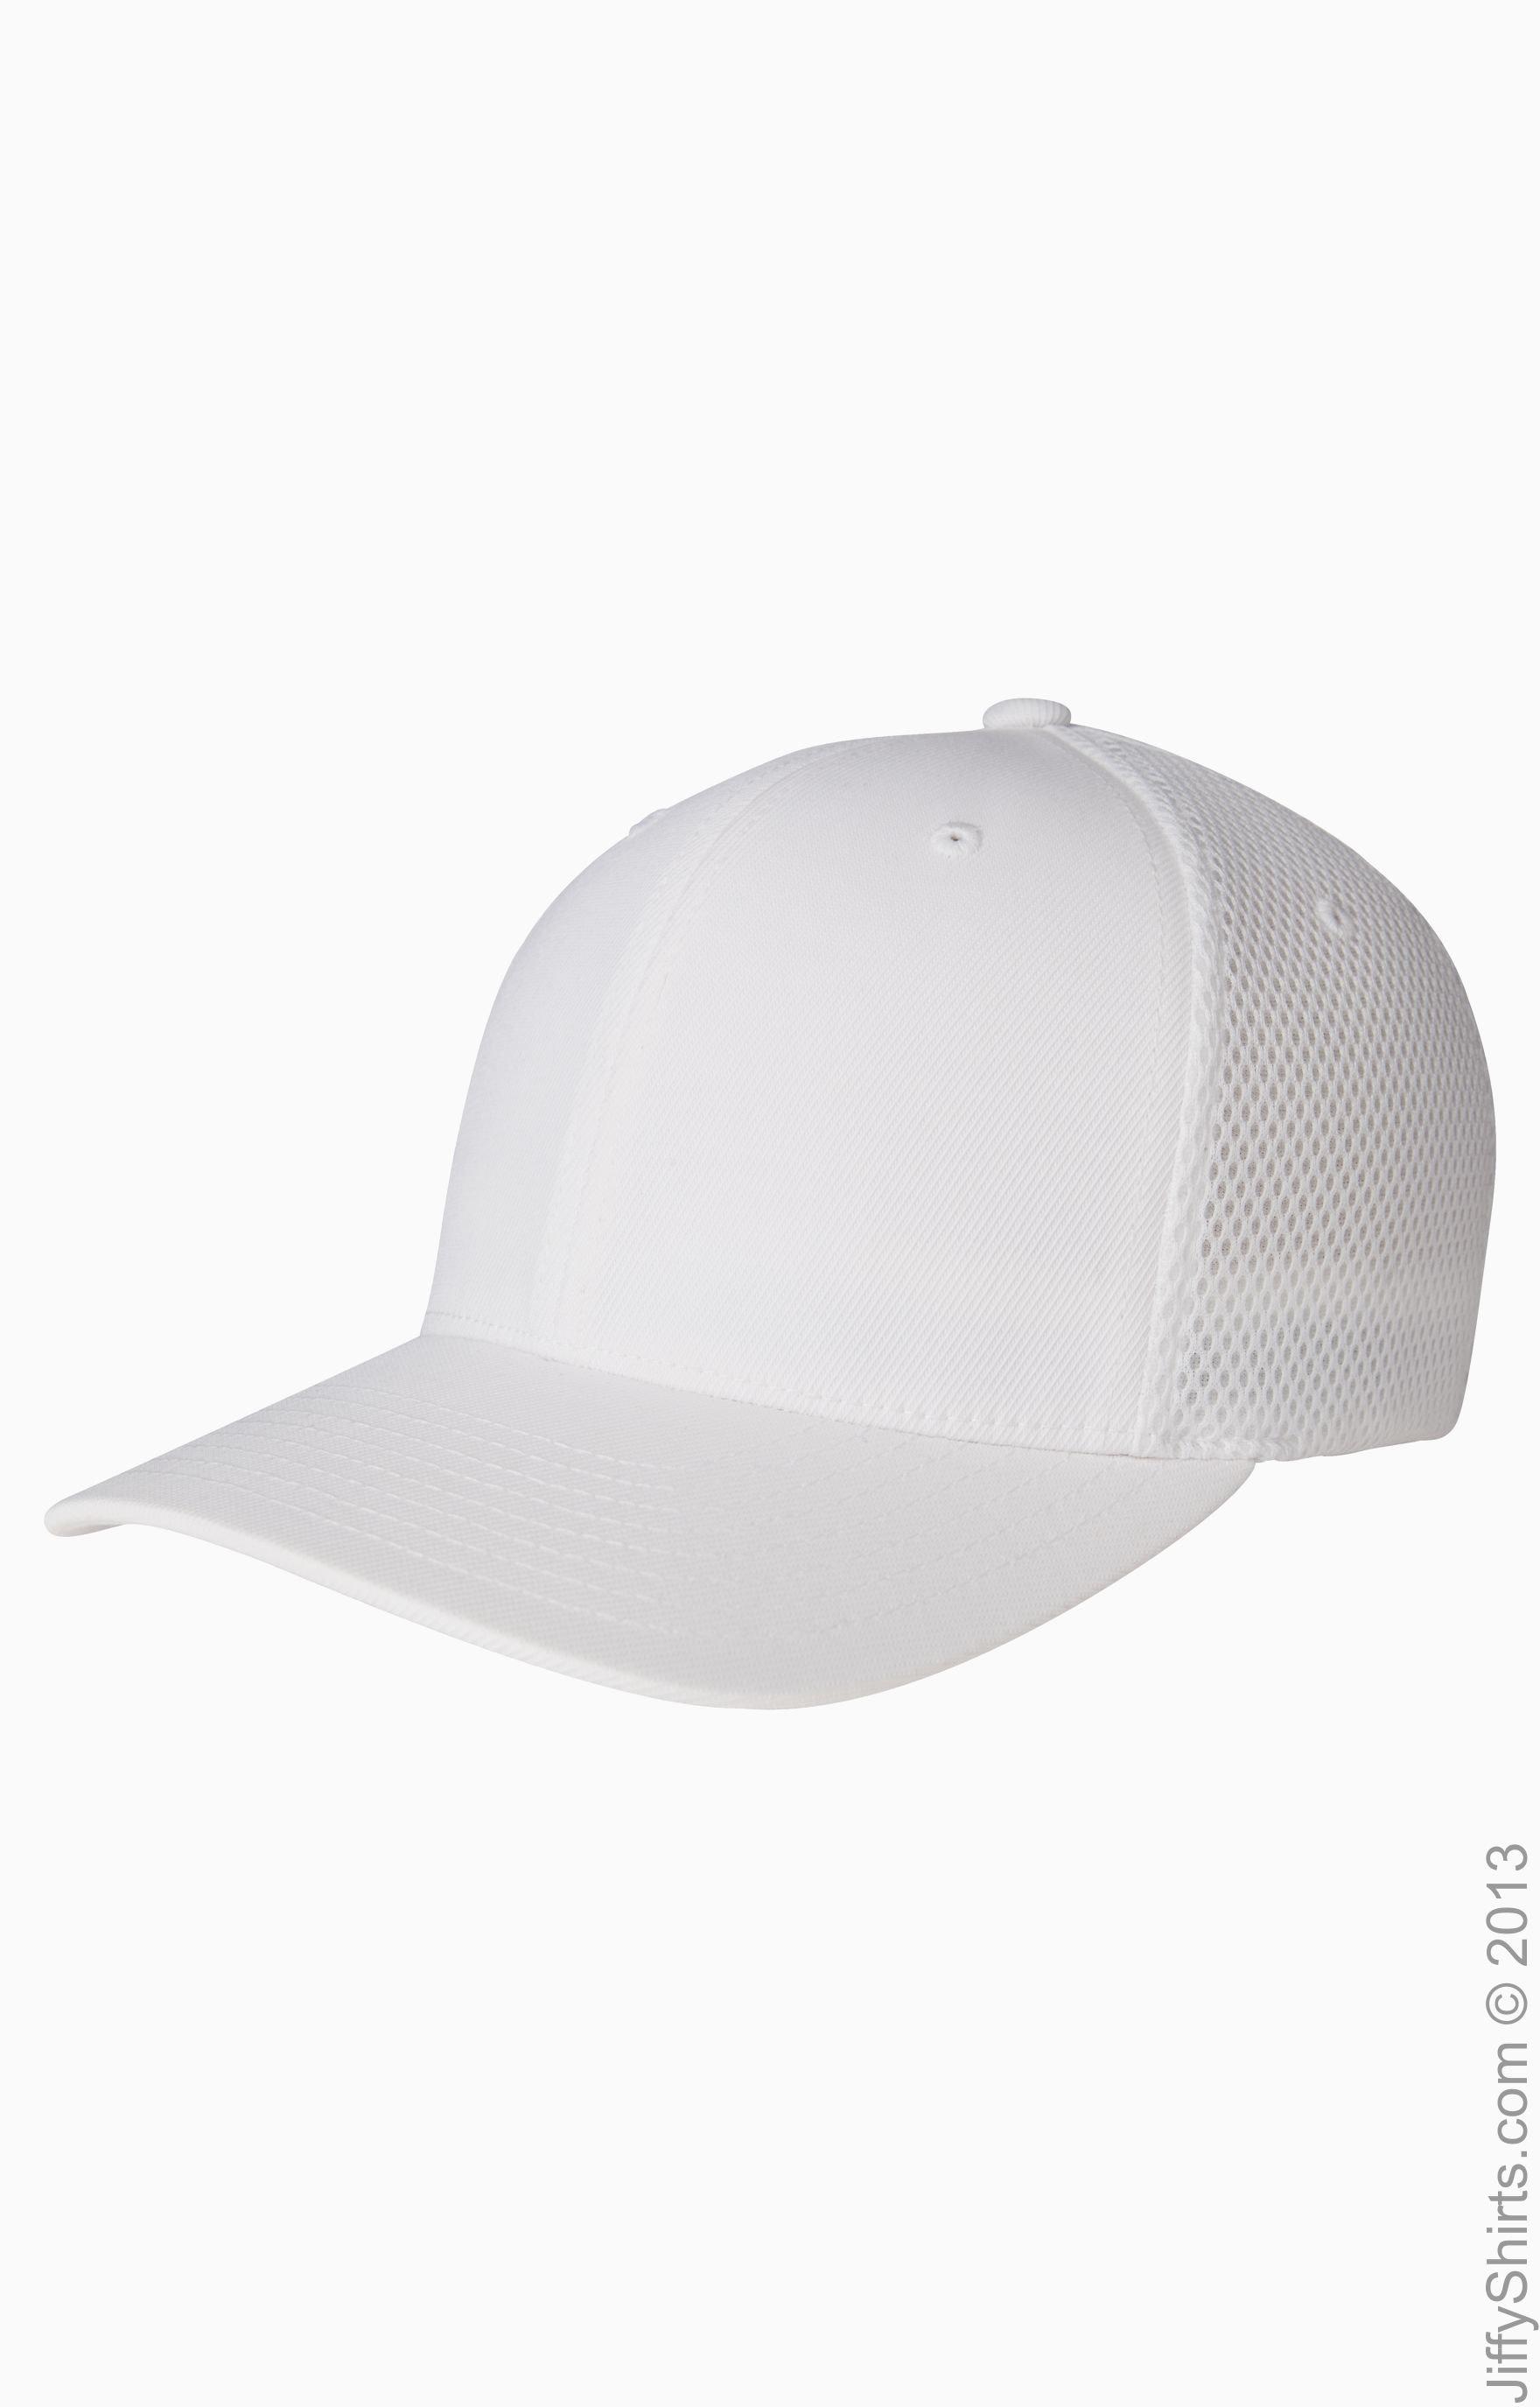 Flexfit 6533 White